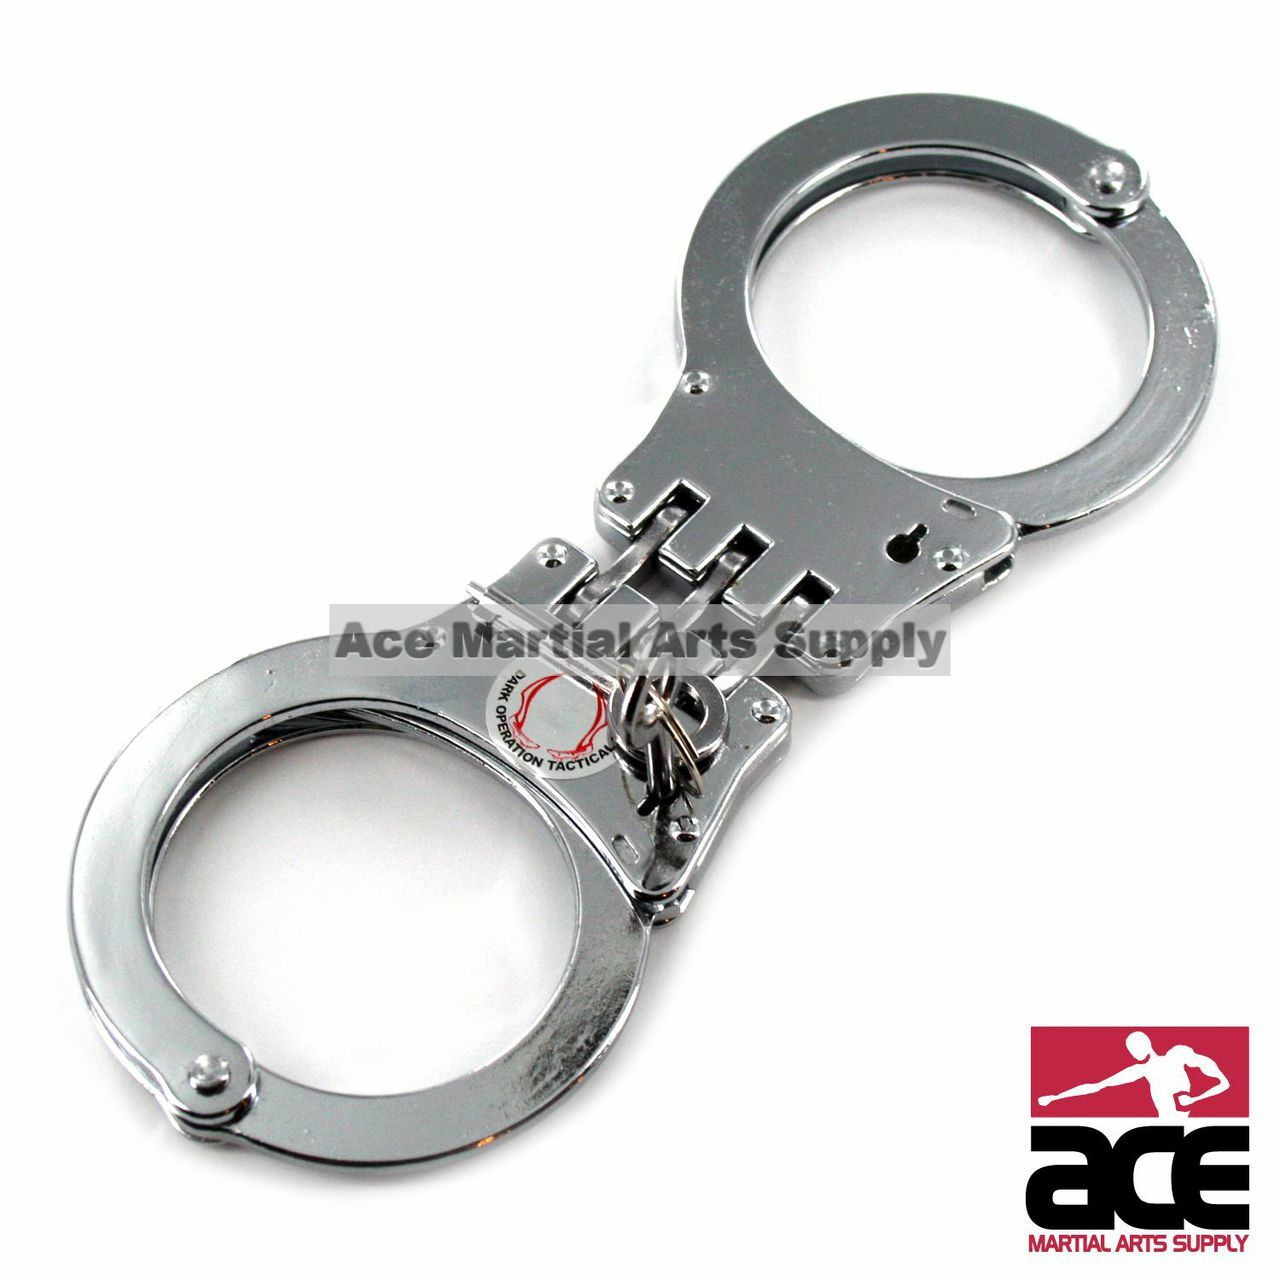 Police Edition Professional Grade Heavy Duty Steel W//Two Keys Foxfend Double Locked Hinged Handcuffs